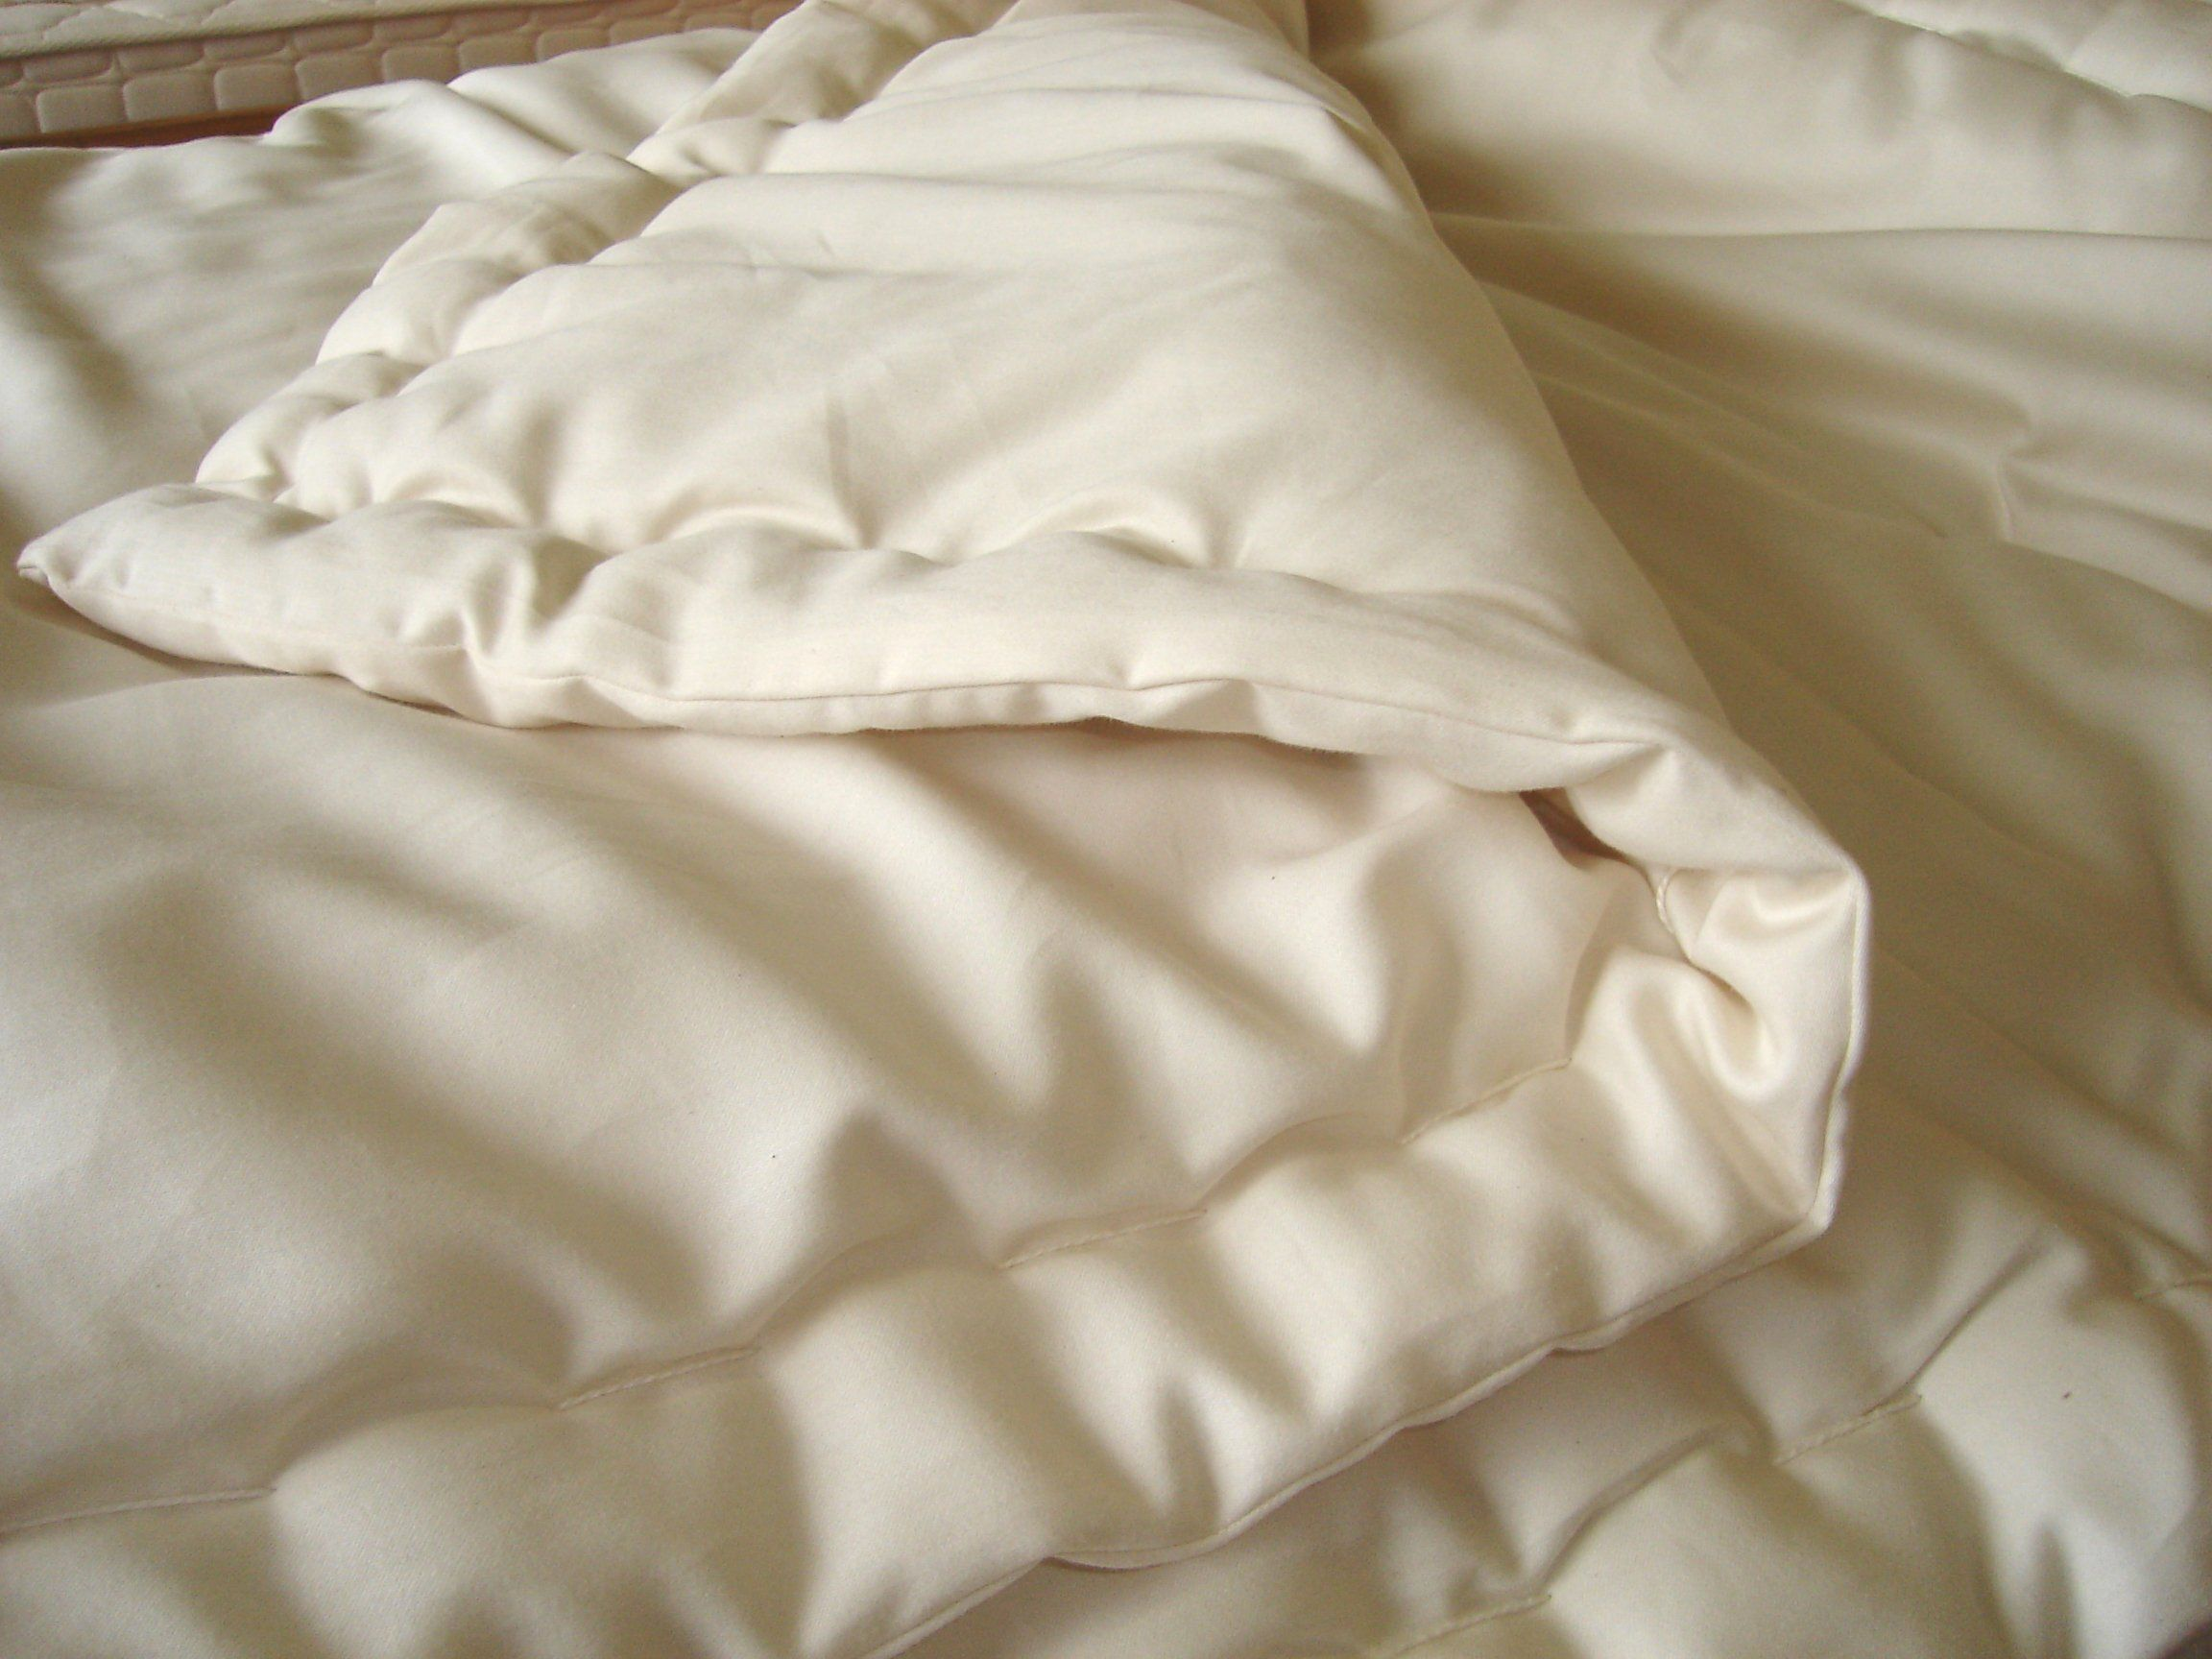 Certified Organic Wool Comforter Organic Wool Bed Linen Design Wool Mattress Pad